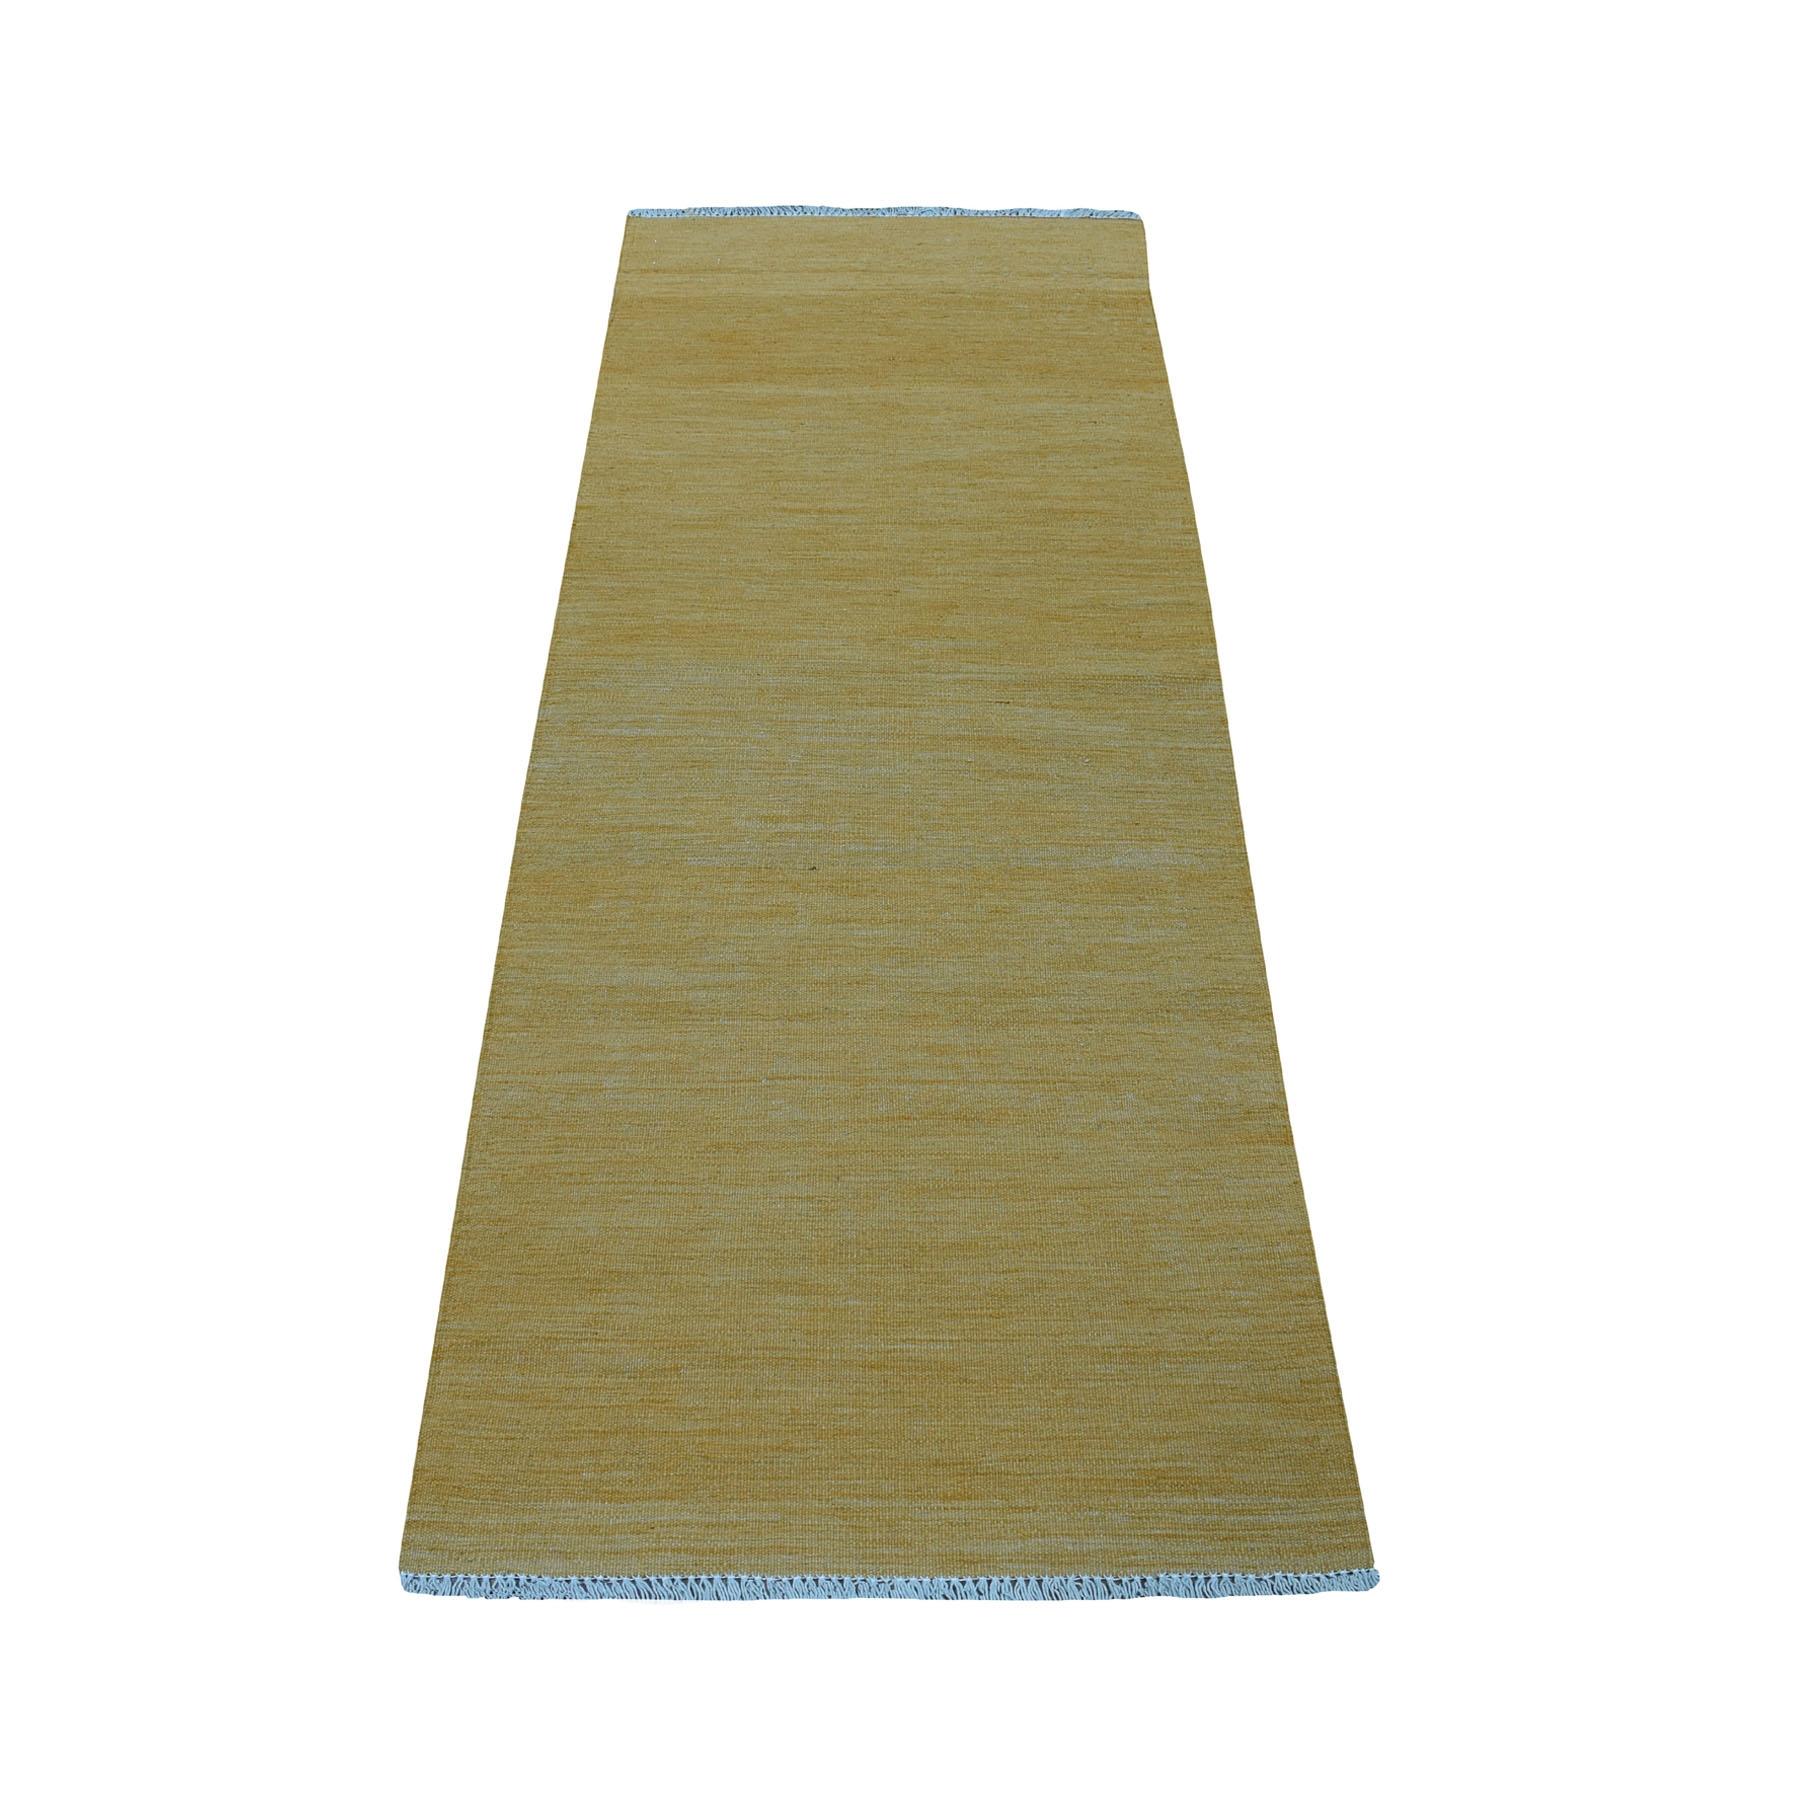 Fine Kilim Collection Hand Woven Yellow Rug No: 01107722